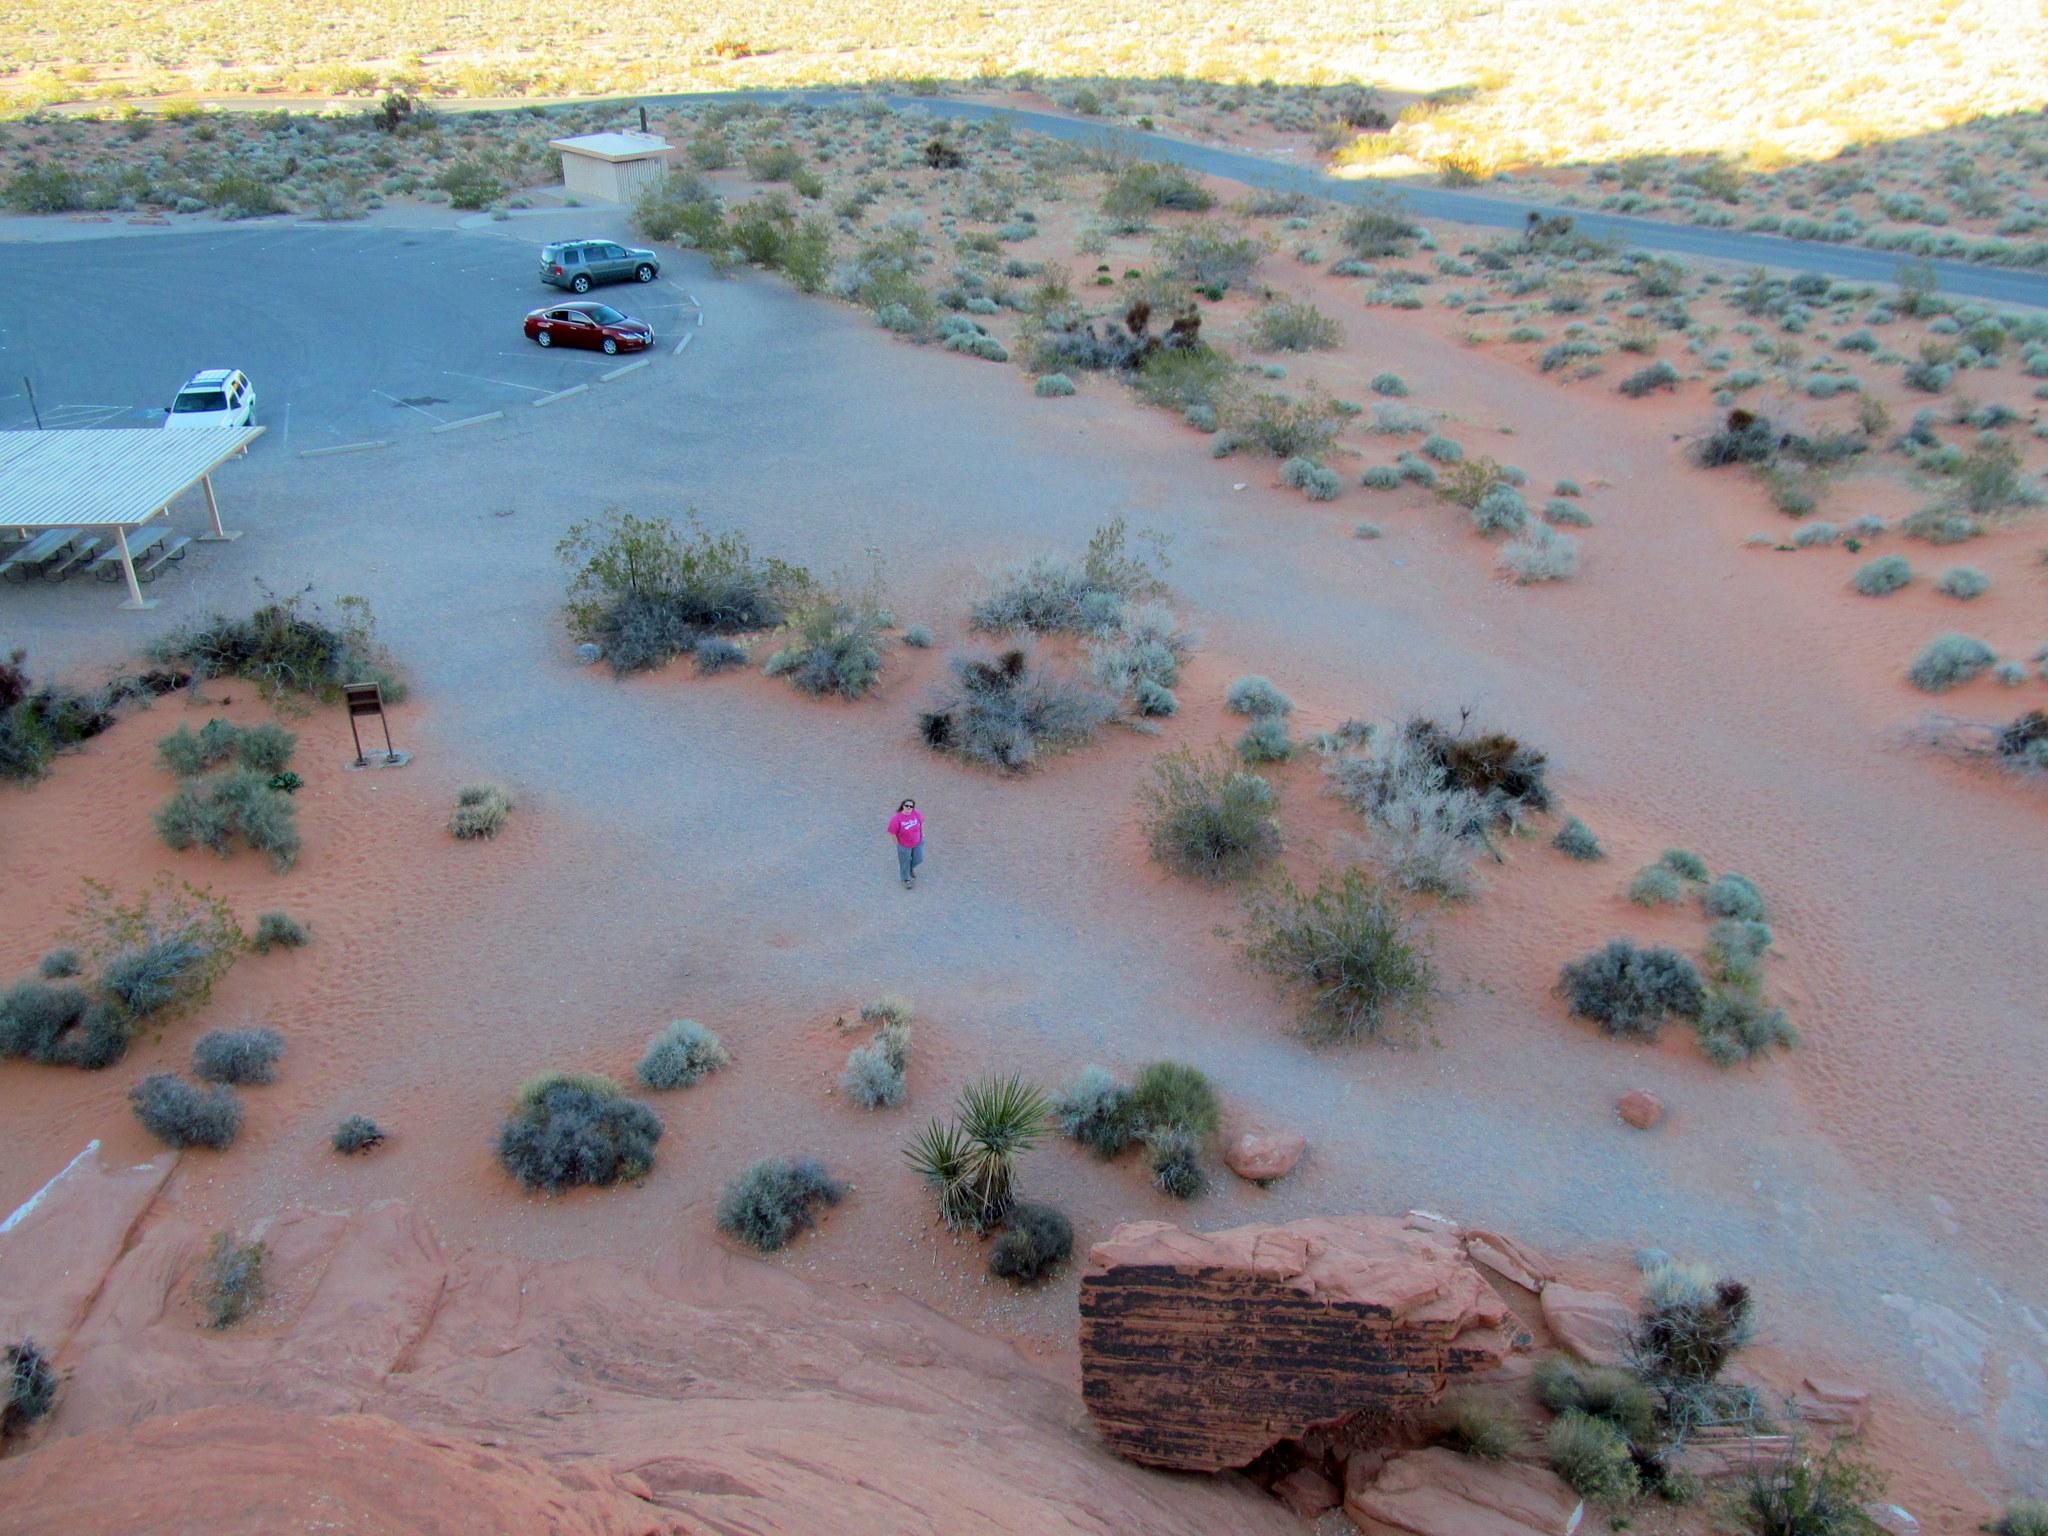 Photo: Traci at the Atlatl Rock parking area